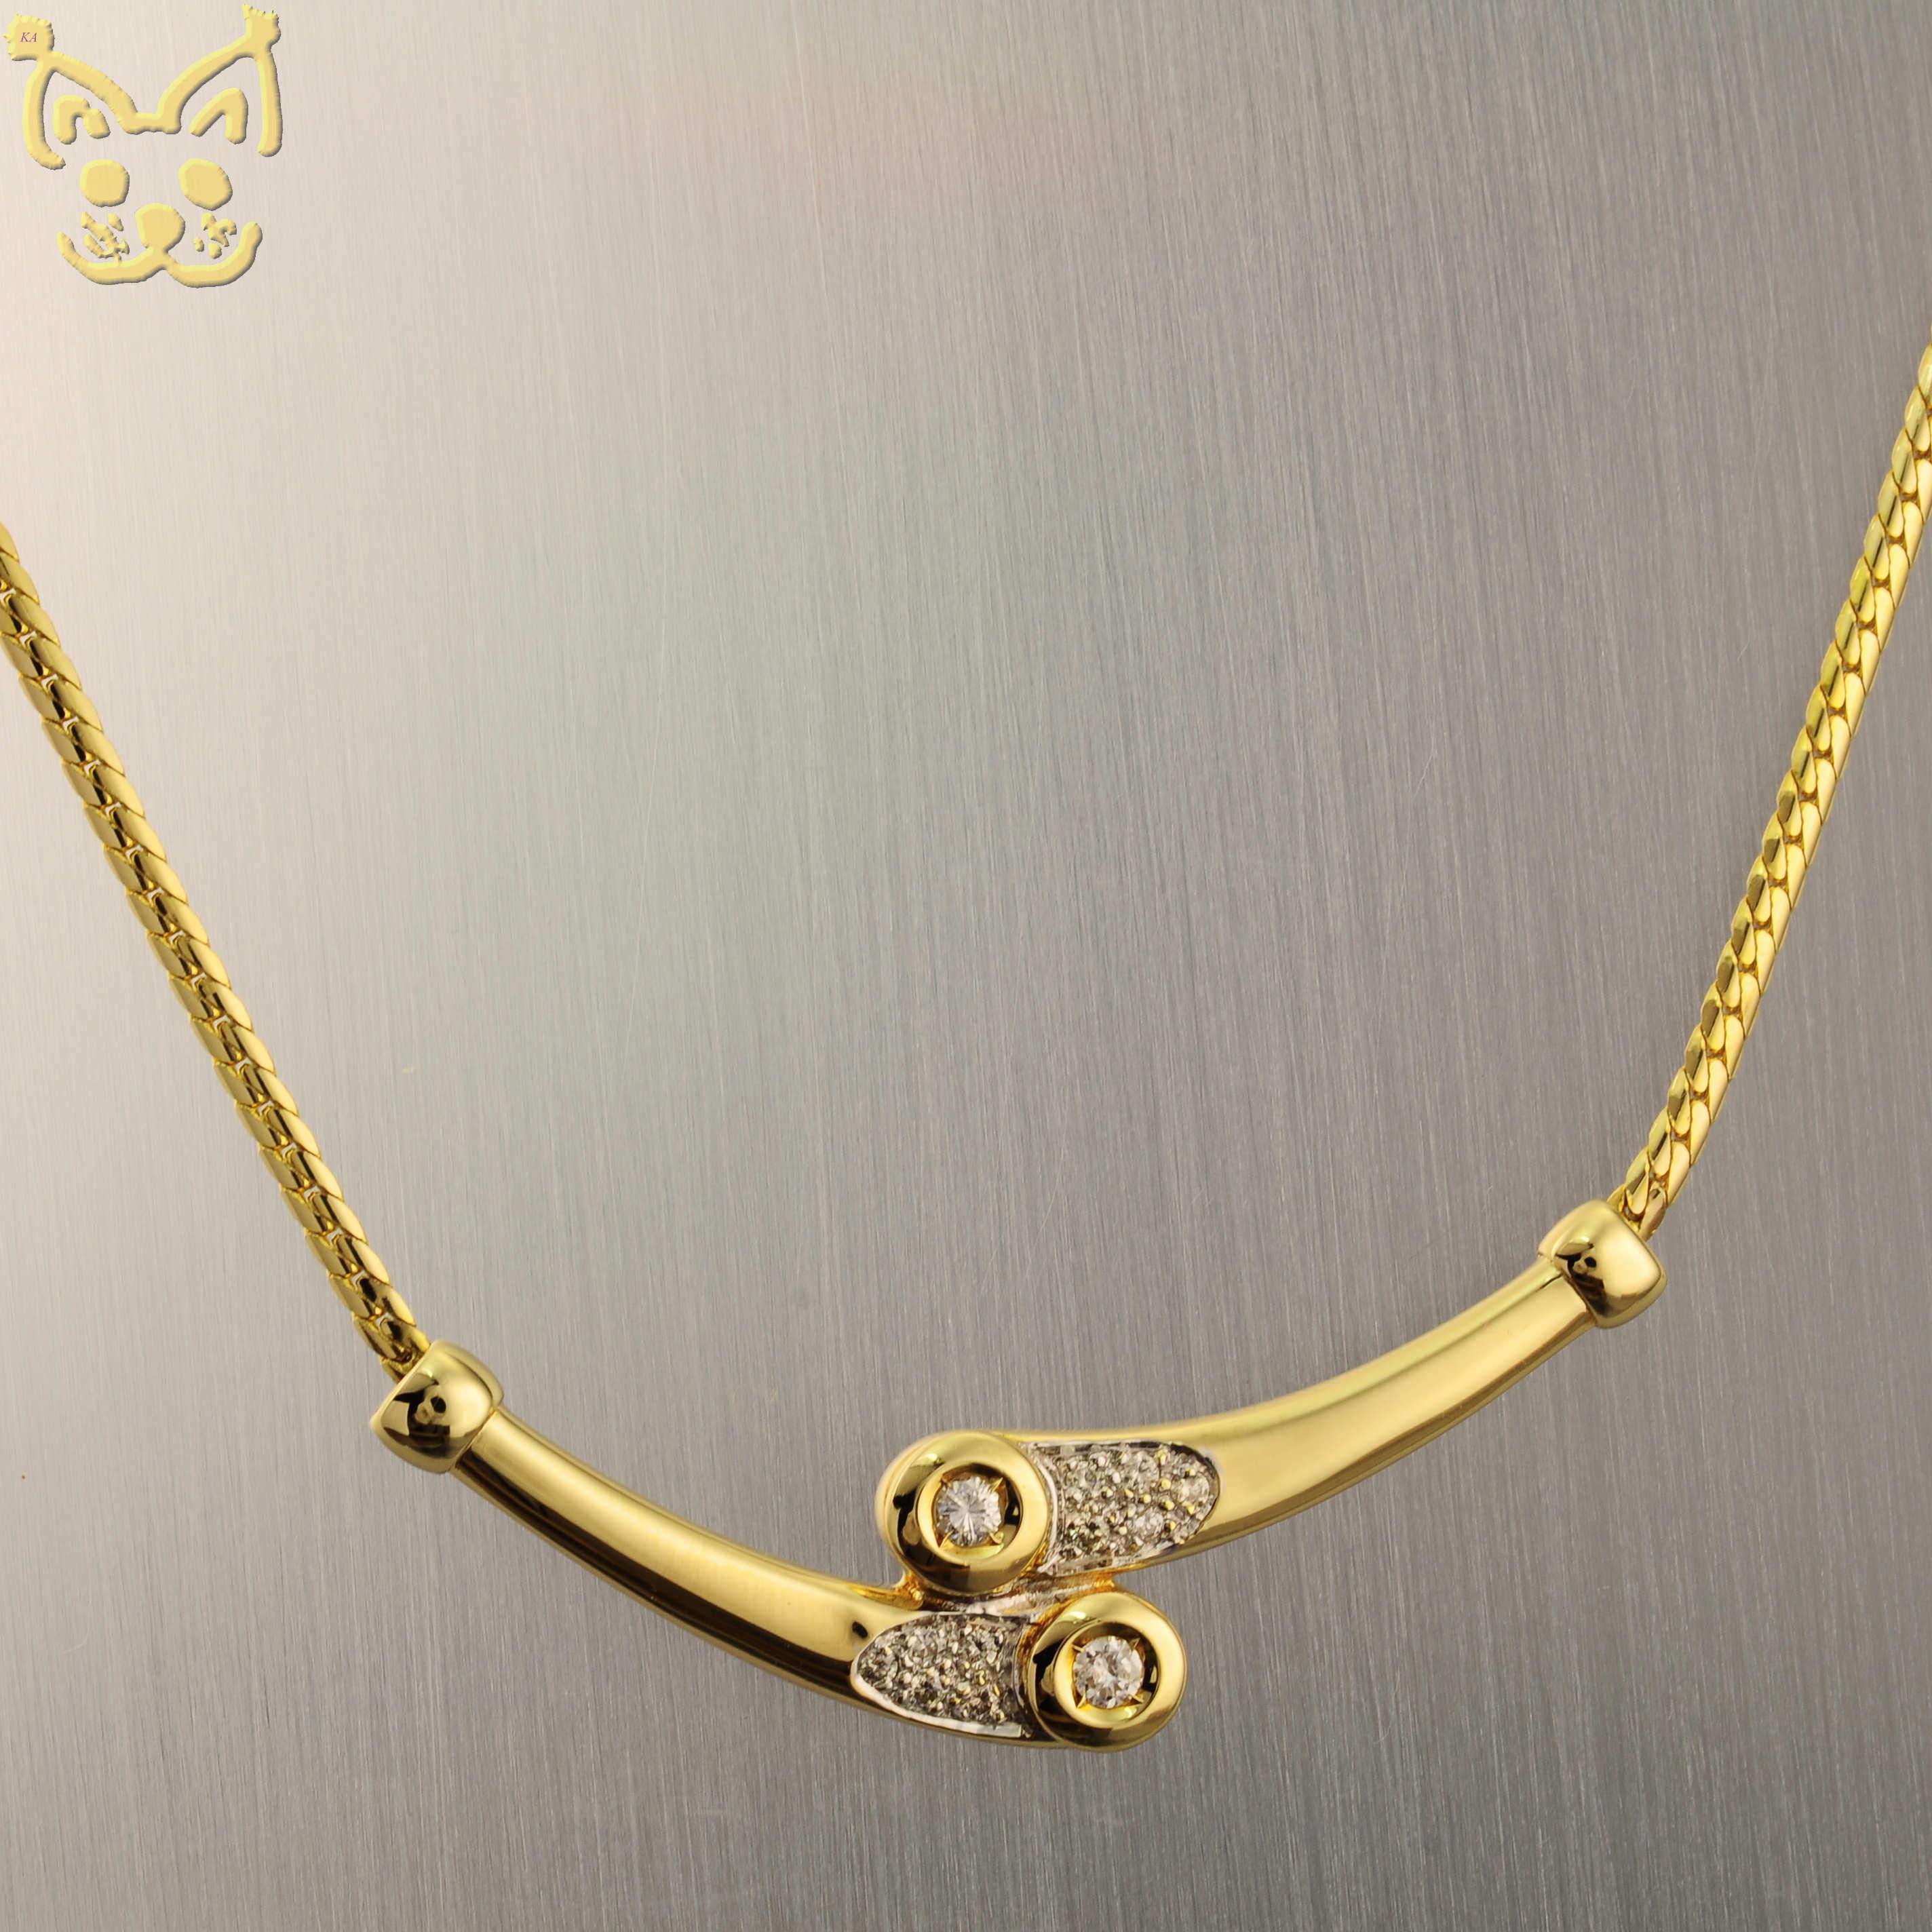 brillant diamant collier kette 0 22ct 46cm 585 14k gold gelbgold schmuck ebay. Black Bedroom Furniture Sets. Home Design Ideas